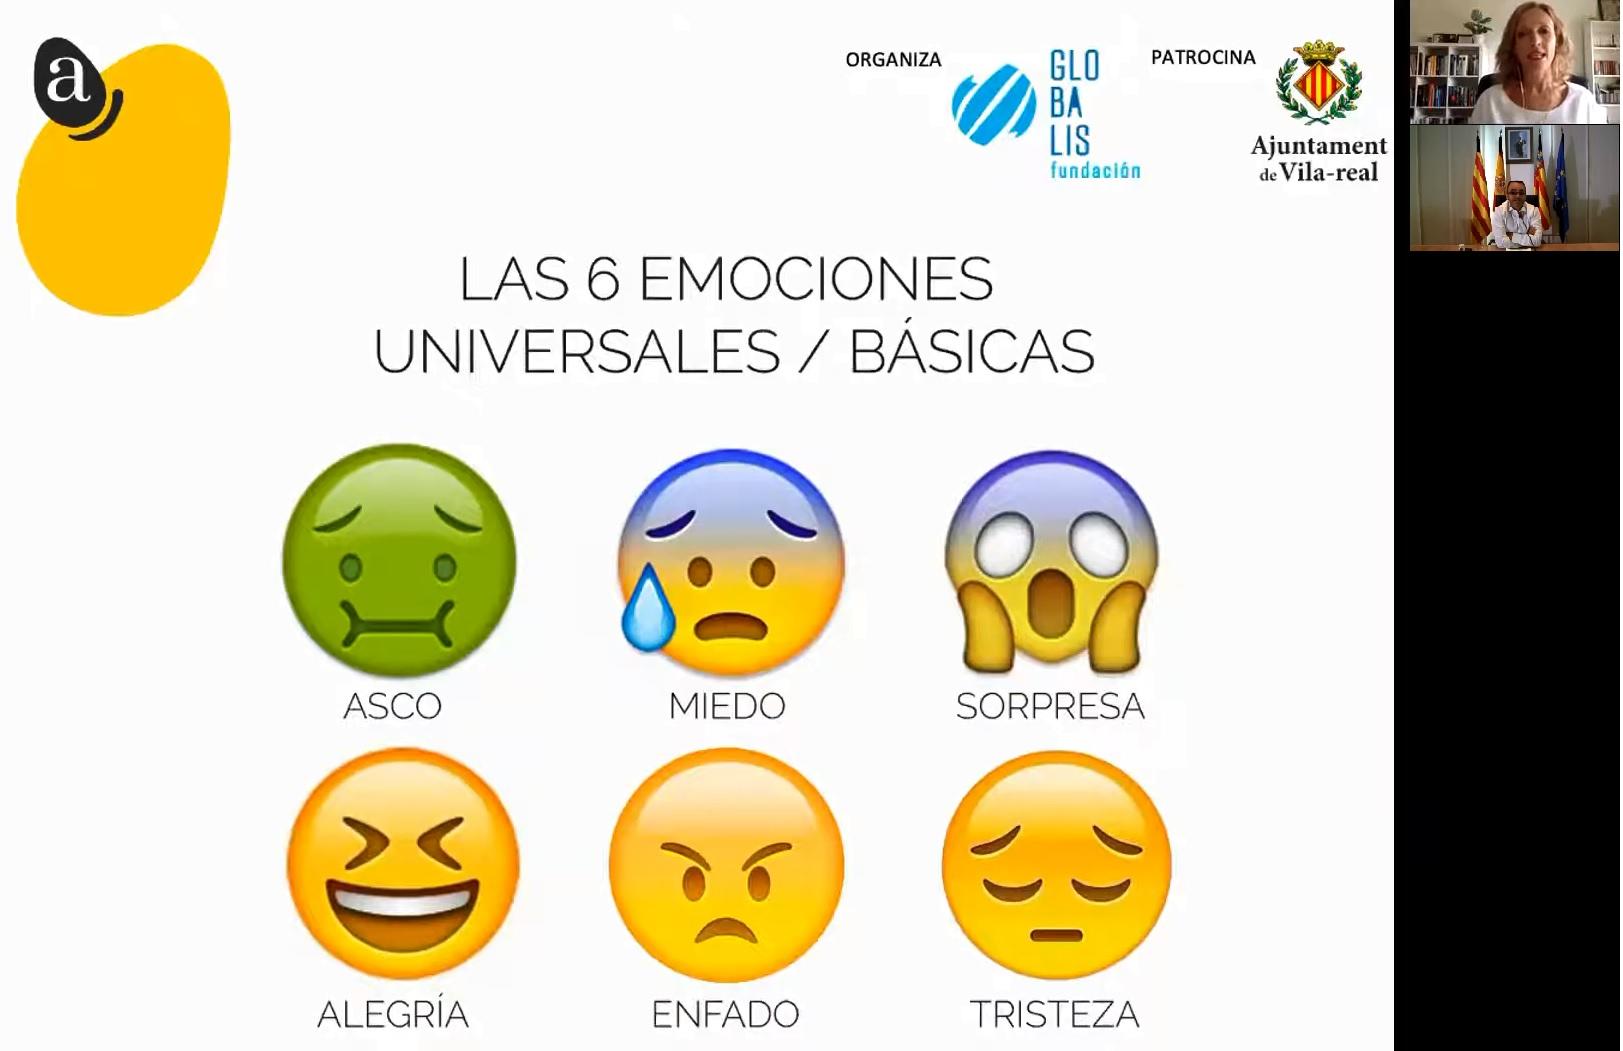 Globalis ofrece talleres gratuitos online sobre distrés y mindfulness